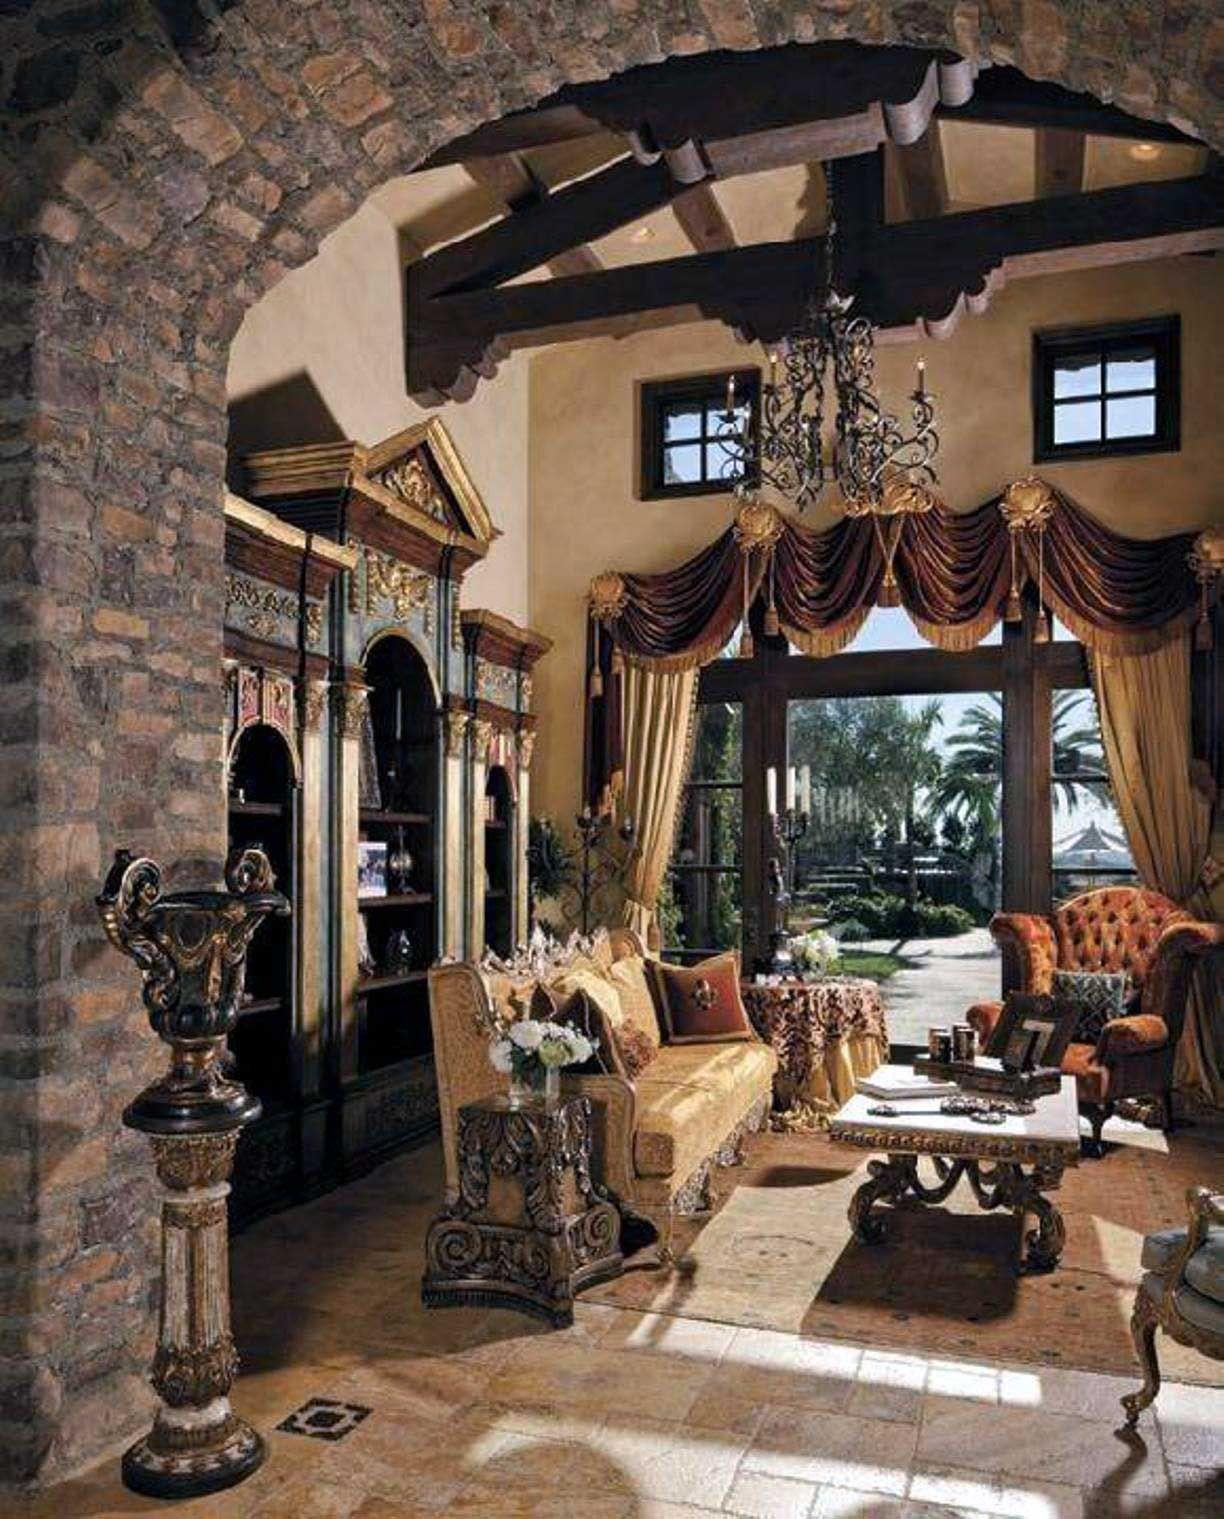 51 Calm Artistic Tuscan Interior Design Tuscan Living Rooms Tuscan Design Mediterranean Home Decor